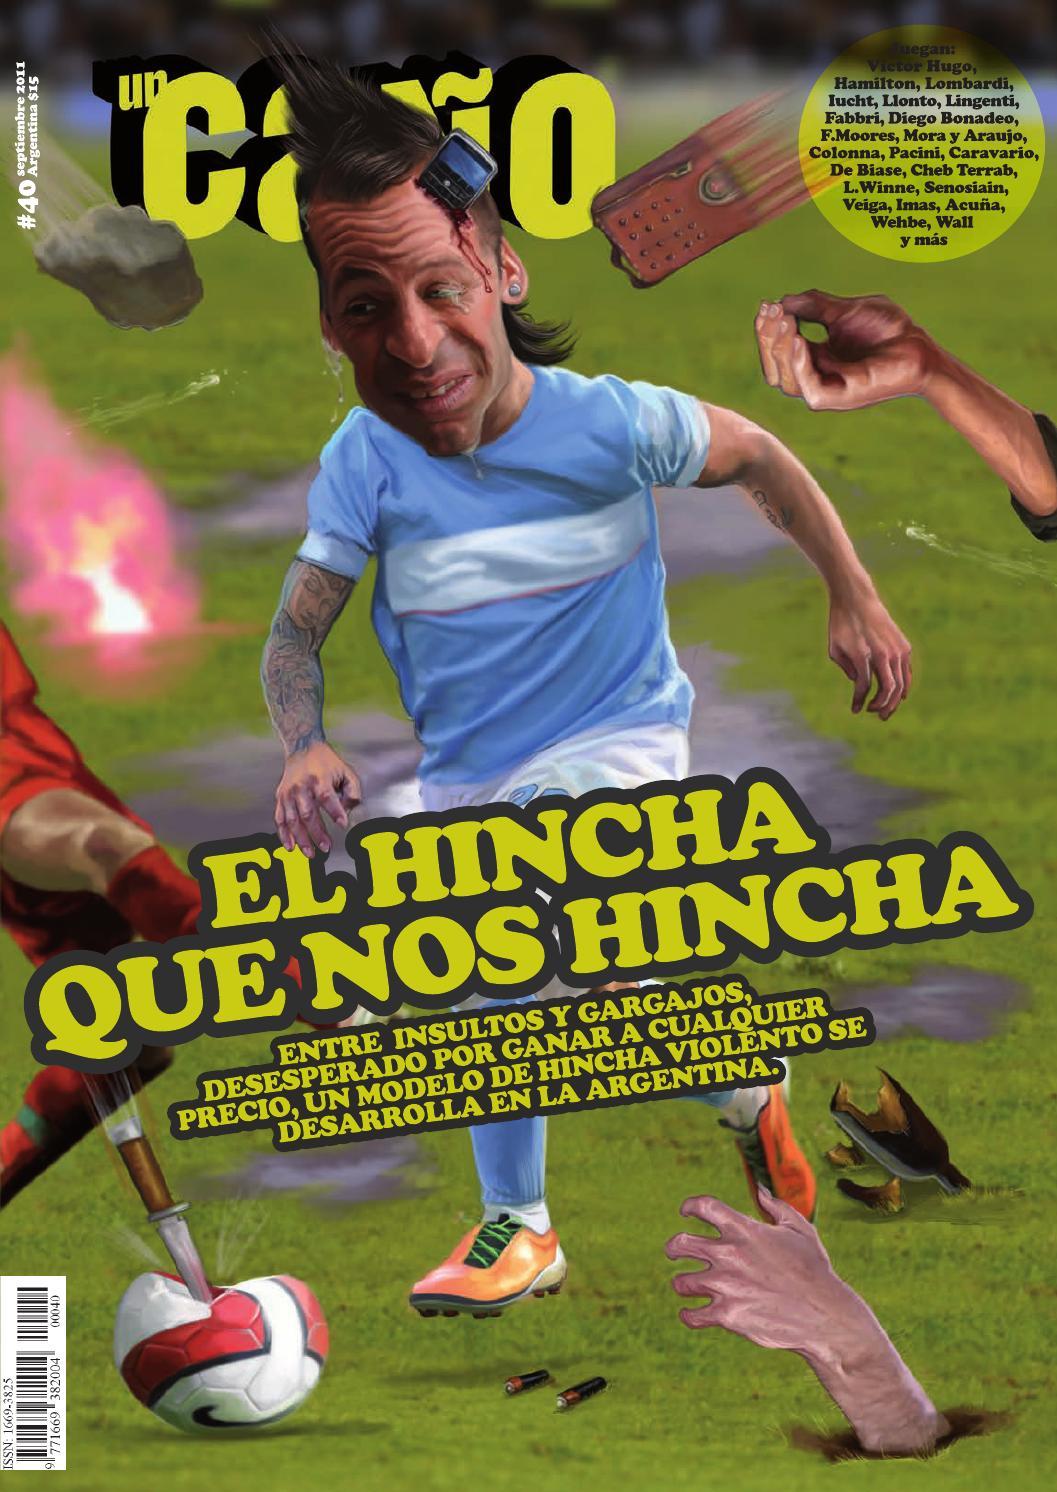 Revista Un Caño - Número 40 - Septiembre 2011 by Revista Un Caño - issuu 037c4ce42f0fc